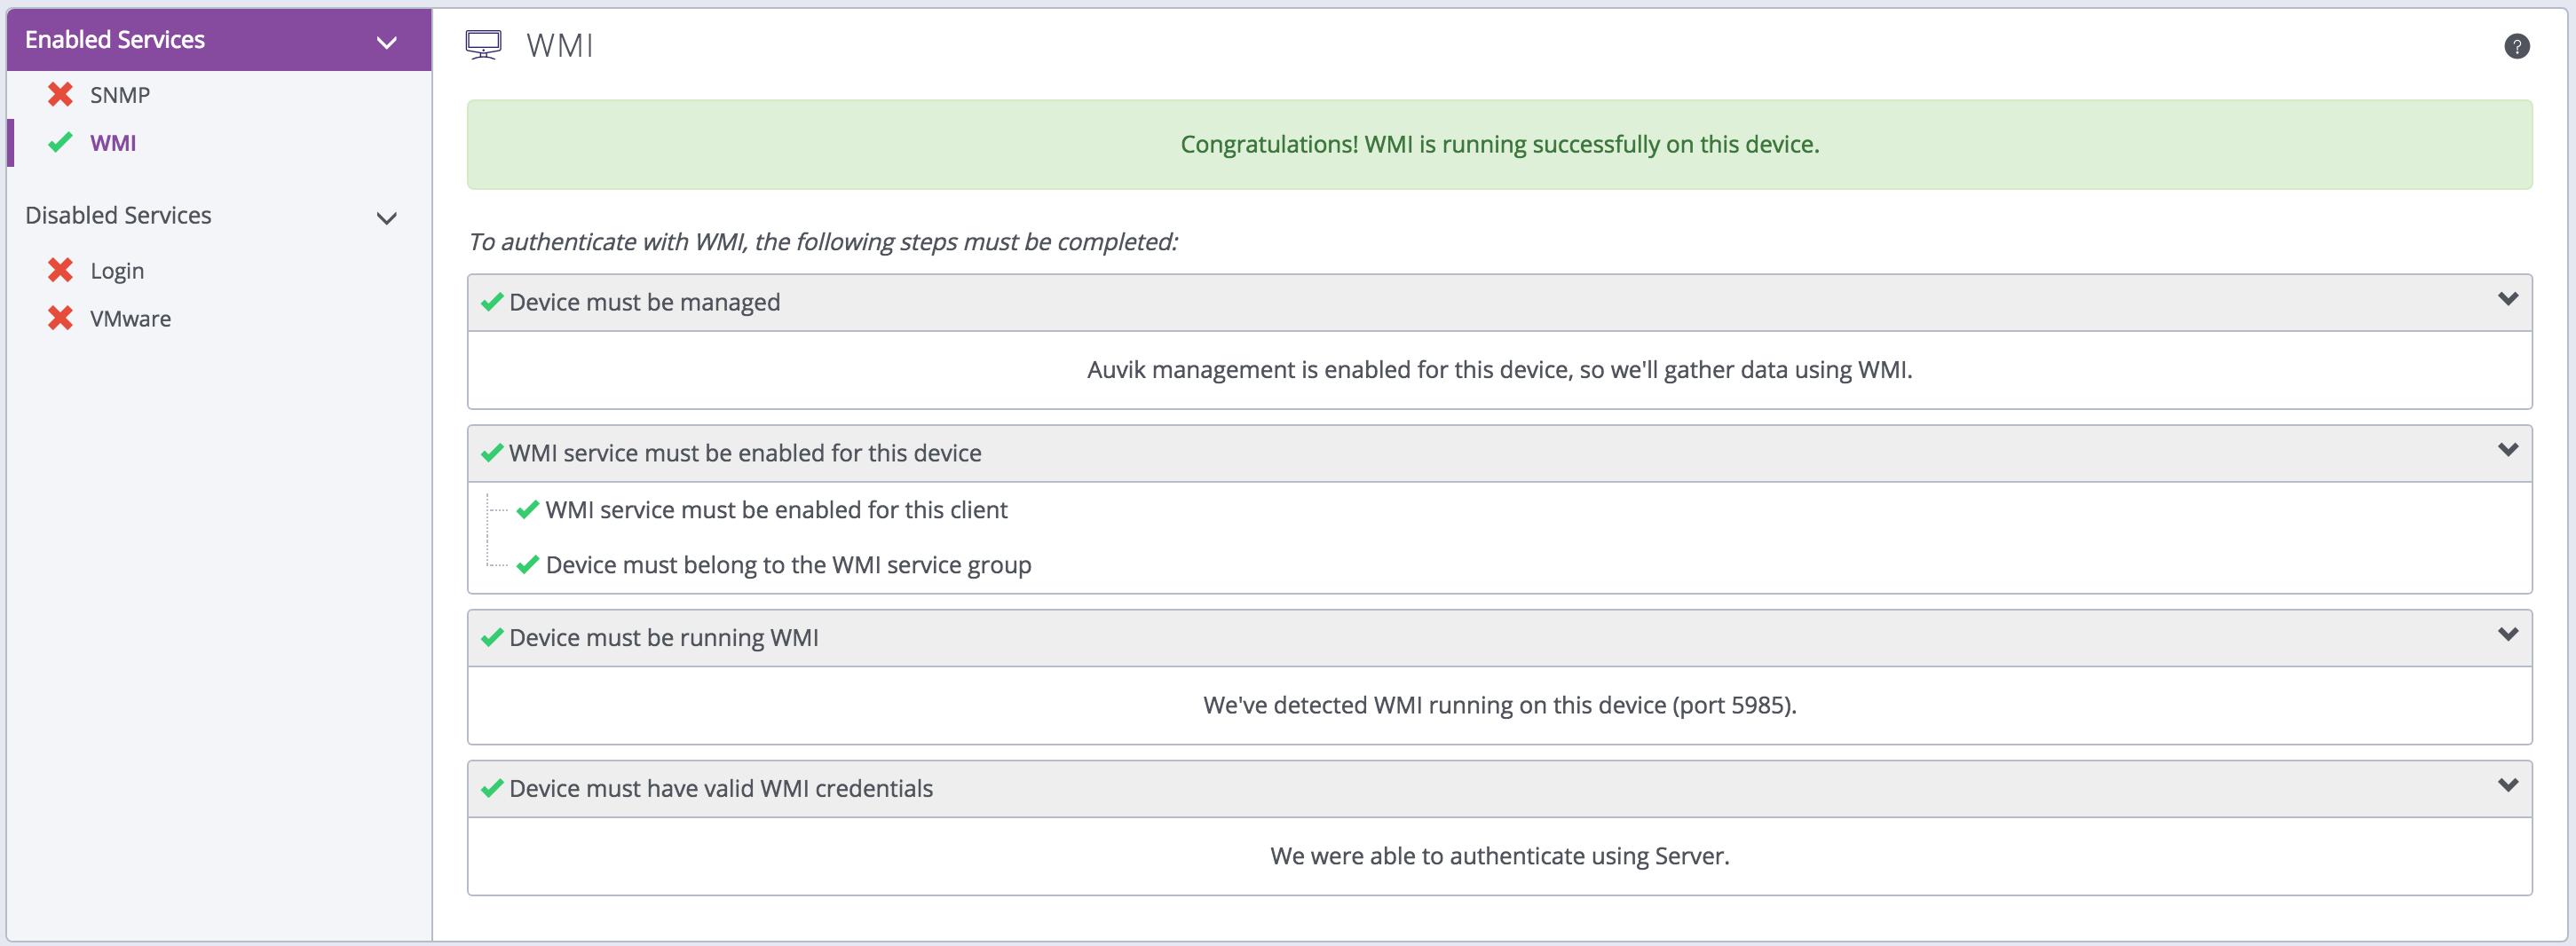 Troubleshooting WMI credentials – Auvik Support